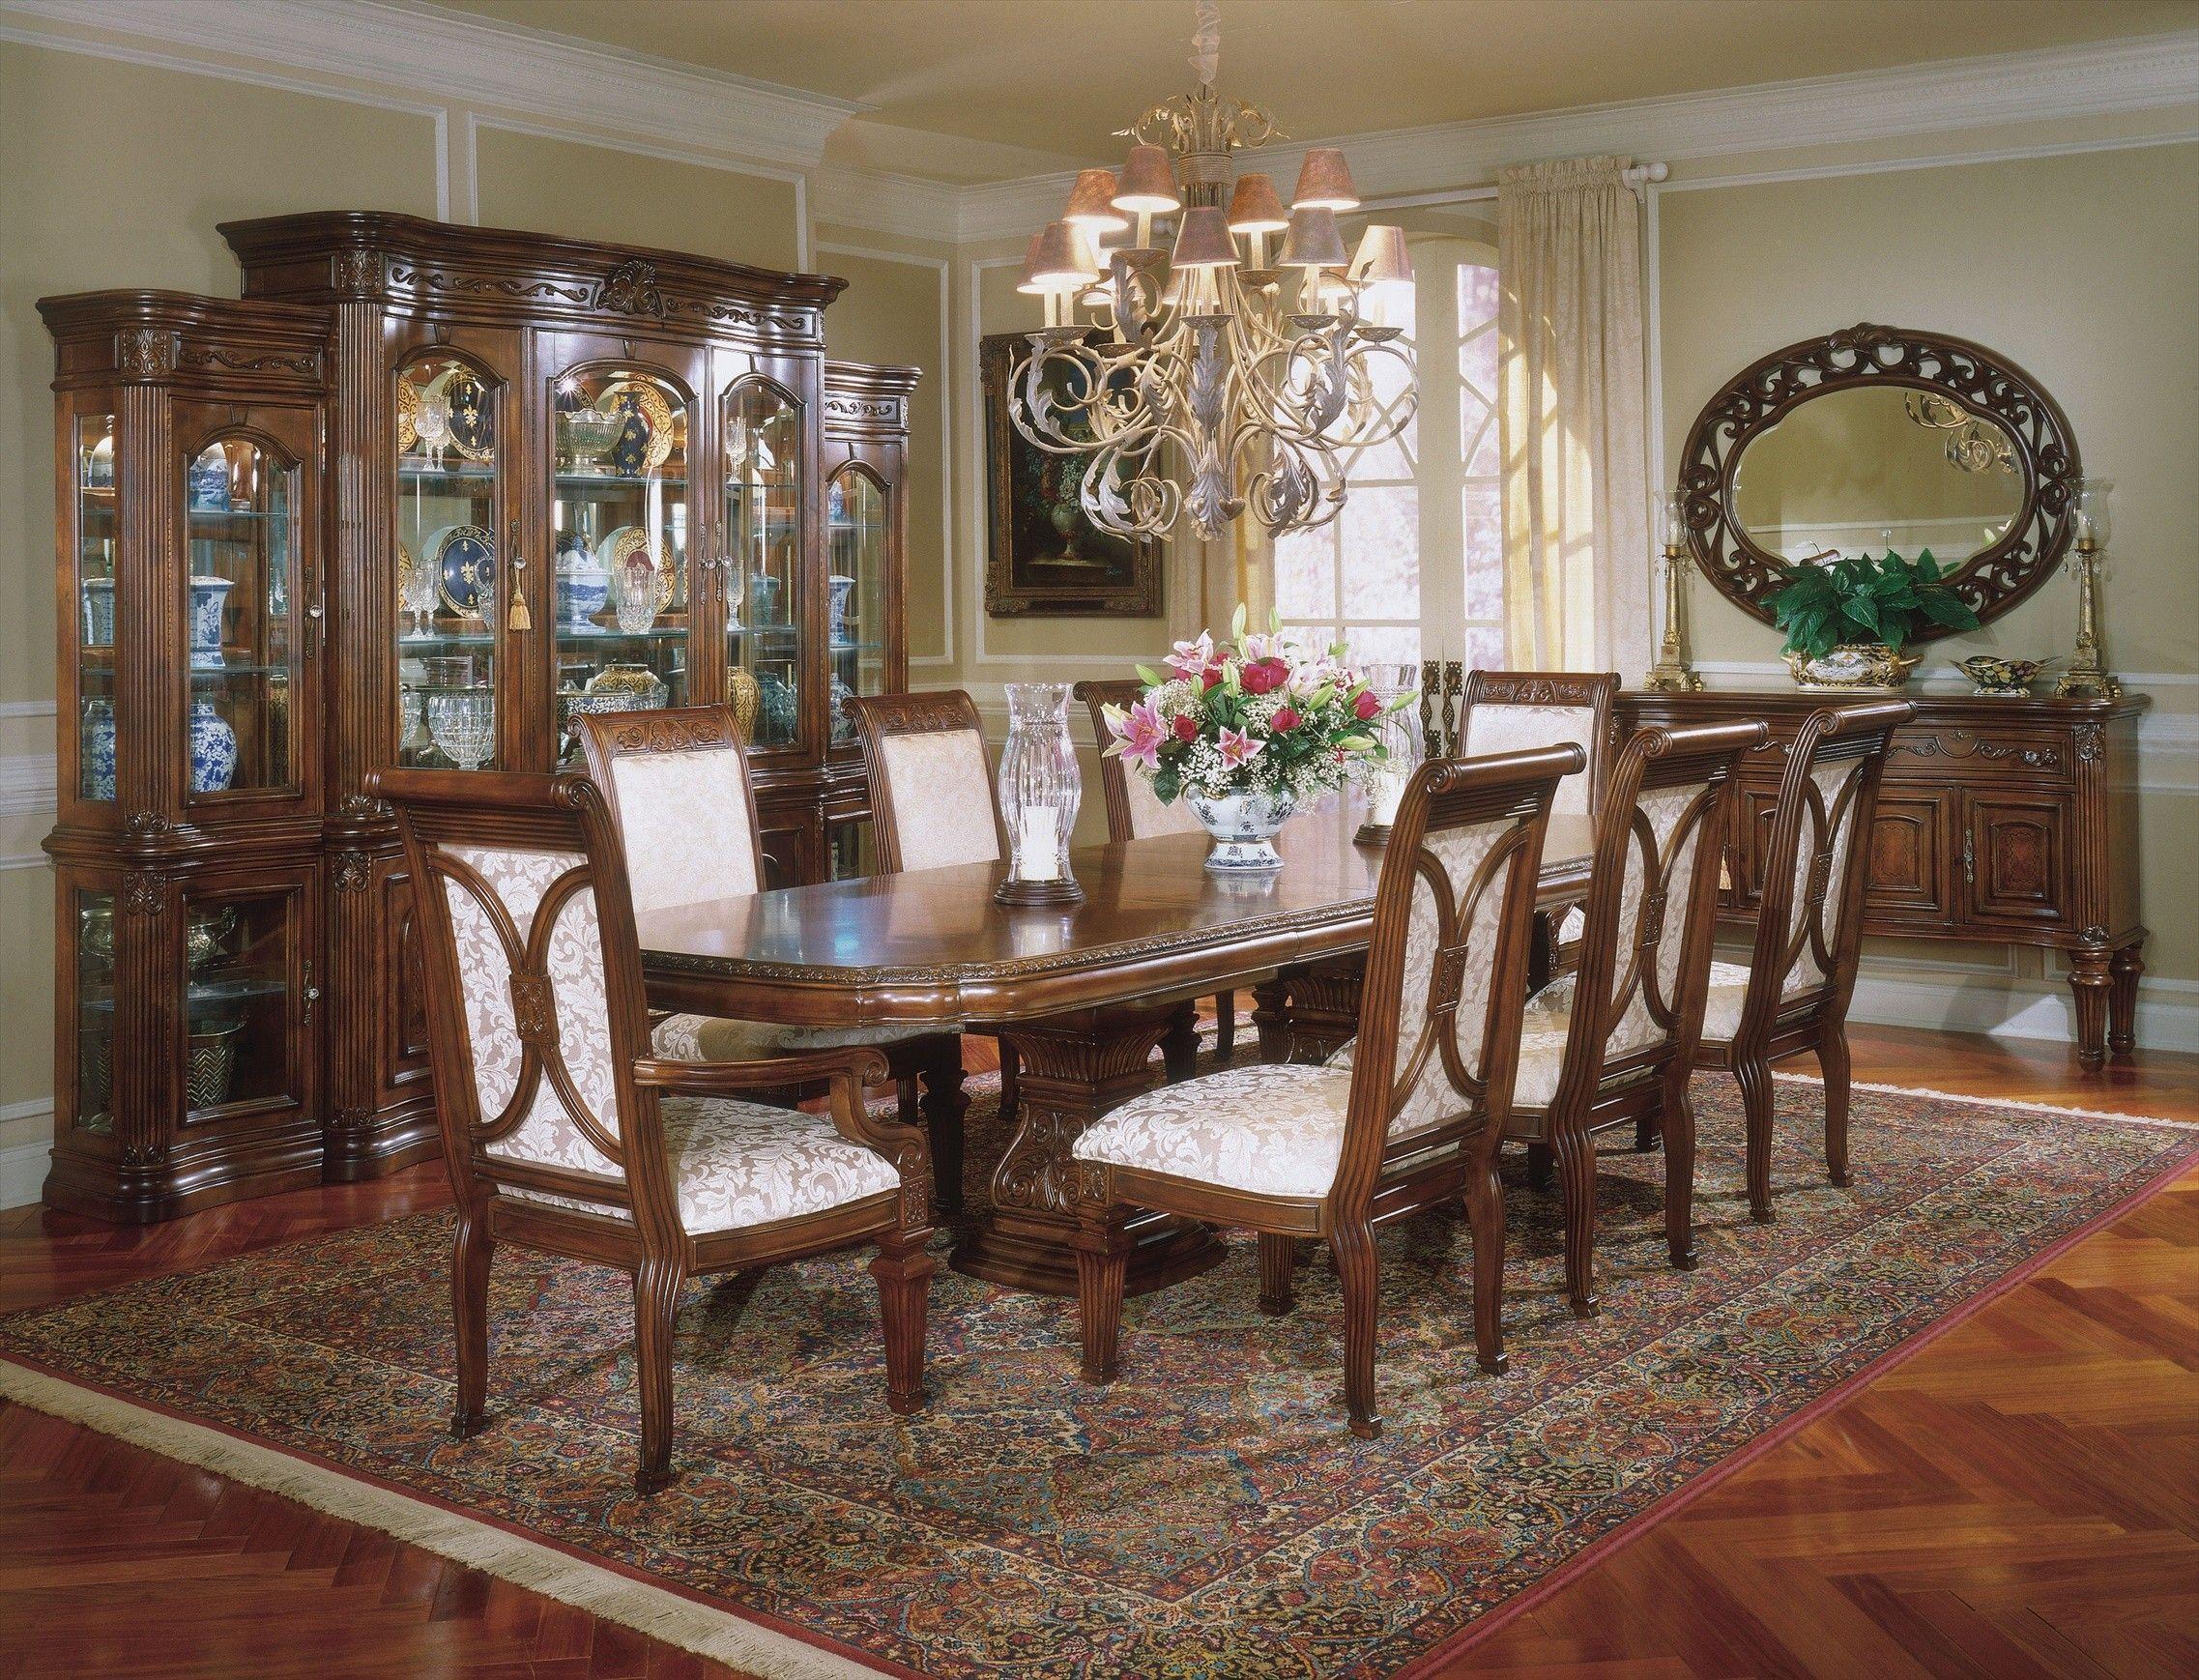 Aico Villagio Rectangular Dining Table Set By Michael Amini By